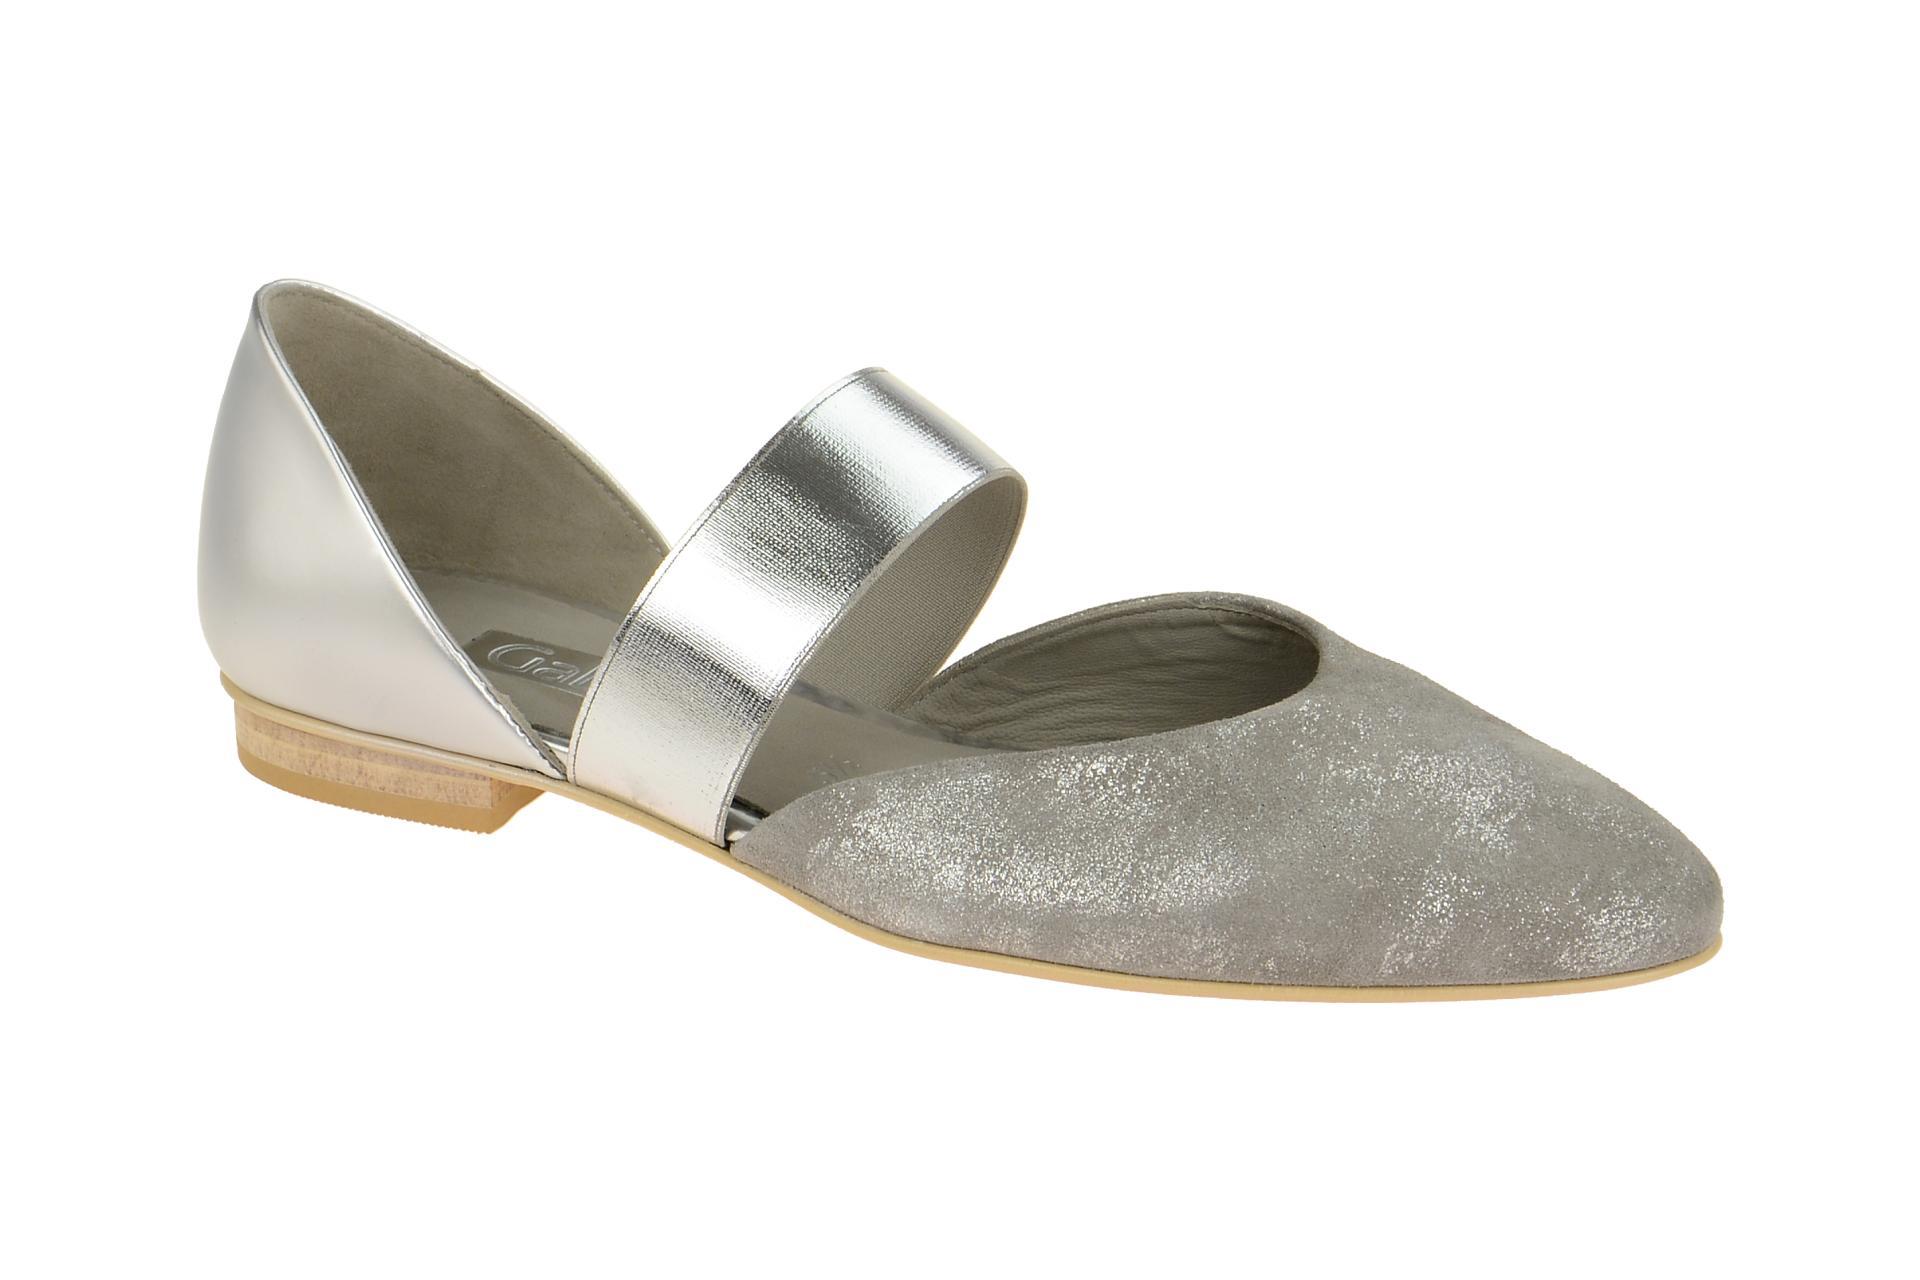 gabor ballerina grau silber metallic gr 39 schuhhaus. Black Bedroom Furniture Sets. Home Design Ideas